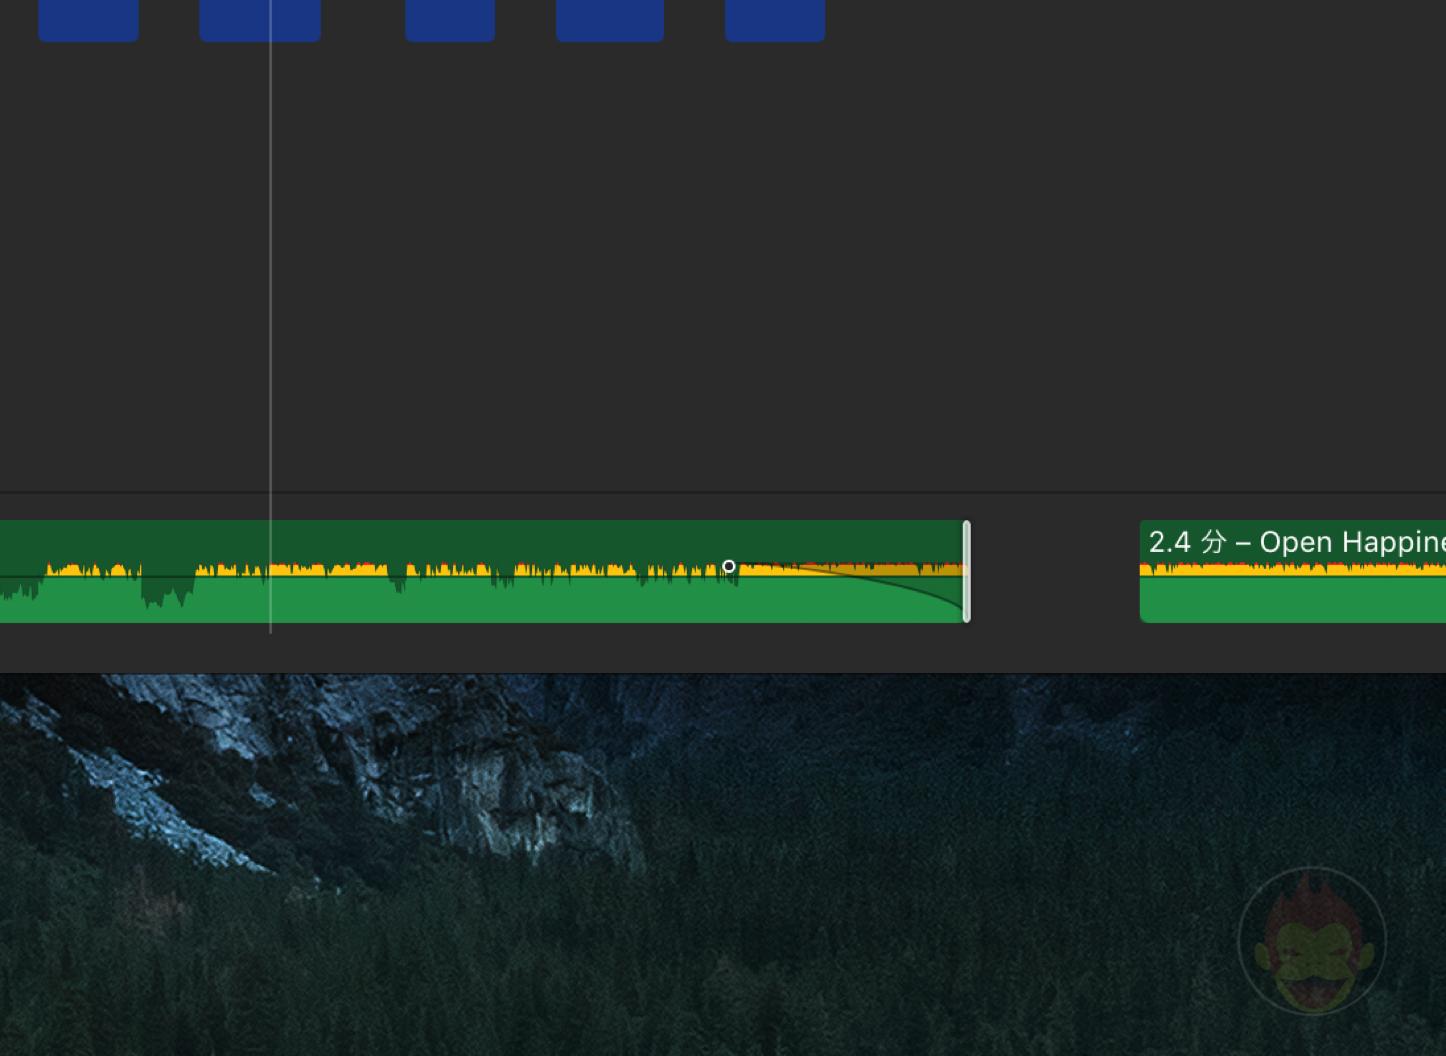 「iMovie '13(10.1.2)」で音楽をフェードアウトする方法